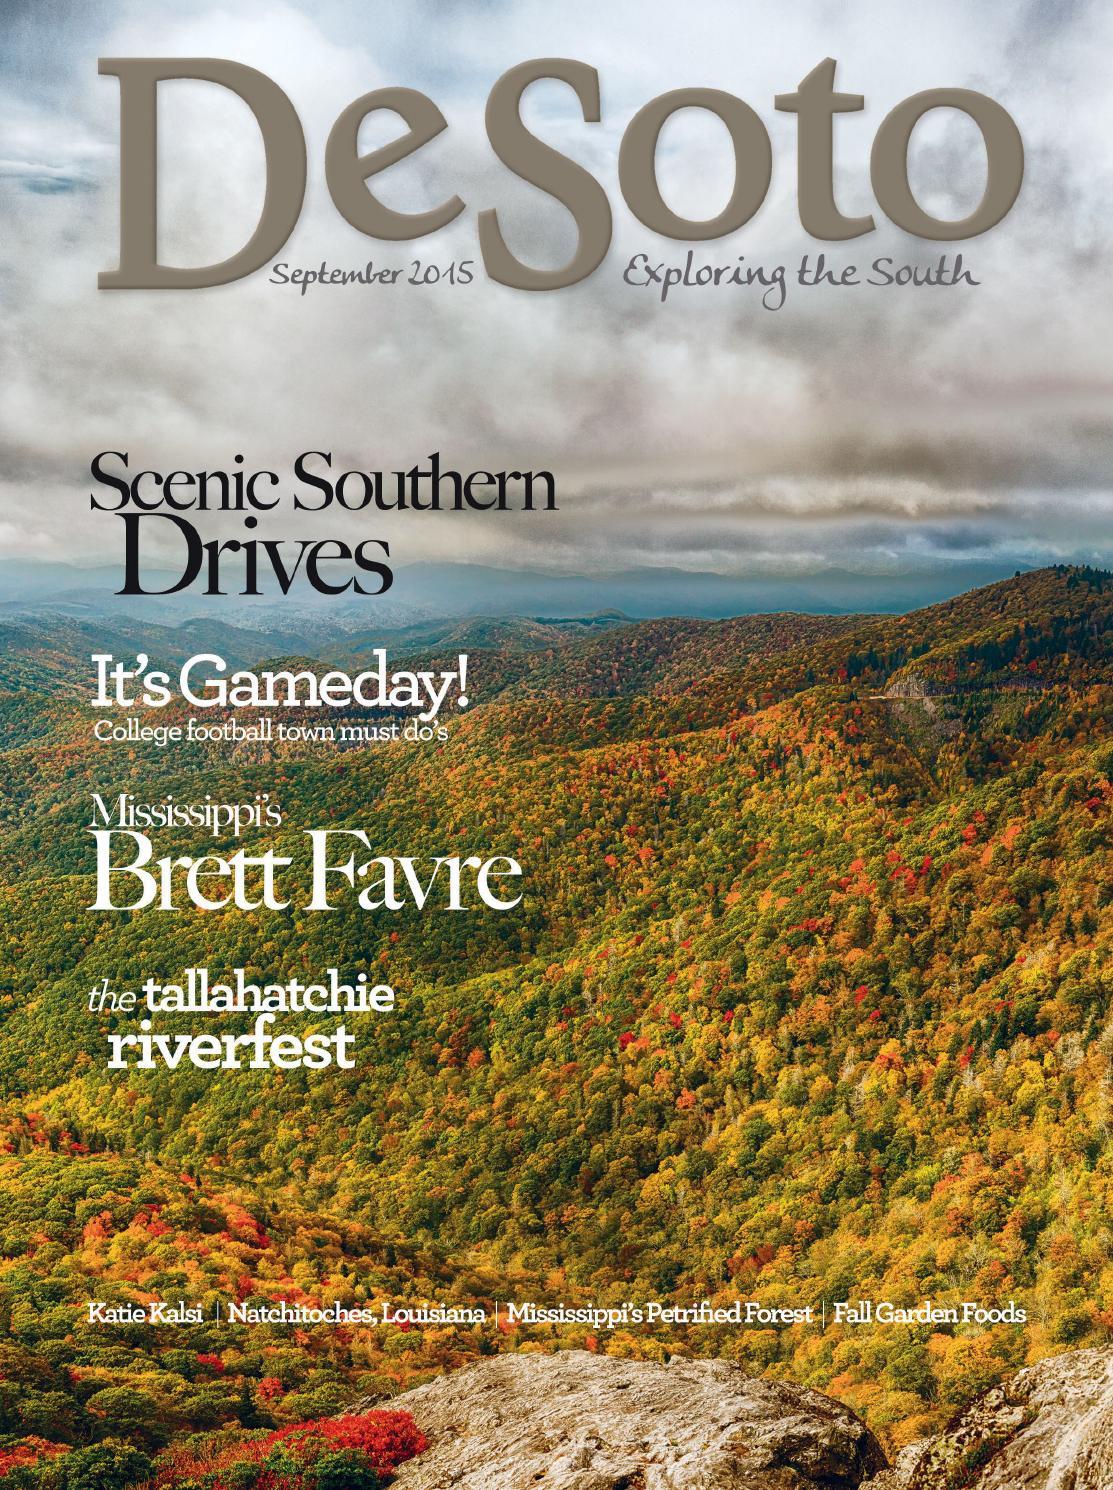 DeSoto Magazine September 2015 by DeSoto Magazine | Exploring the ...